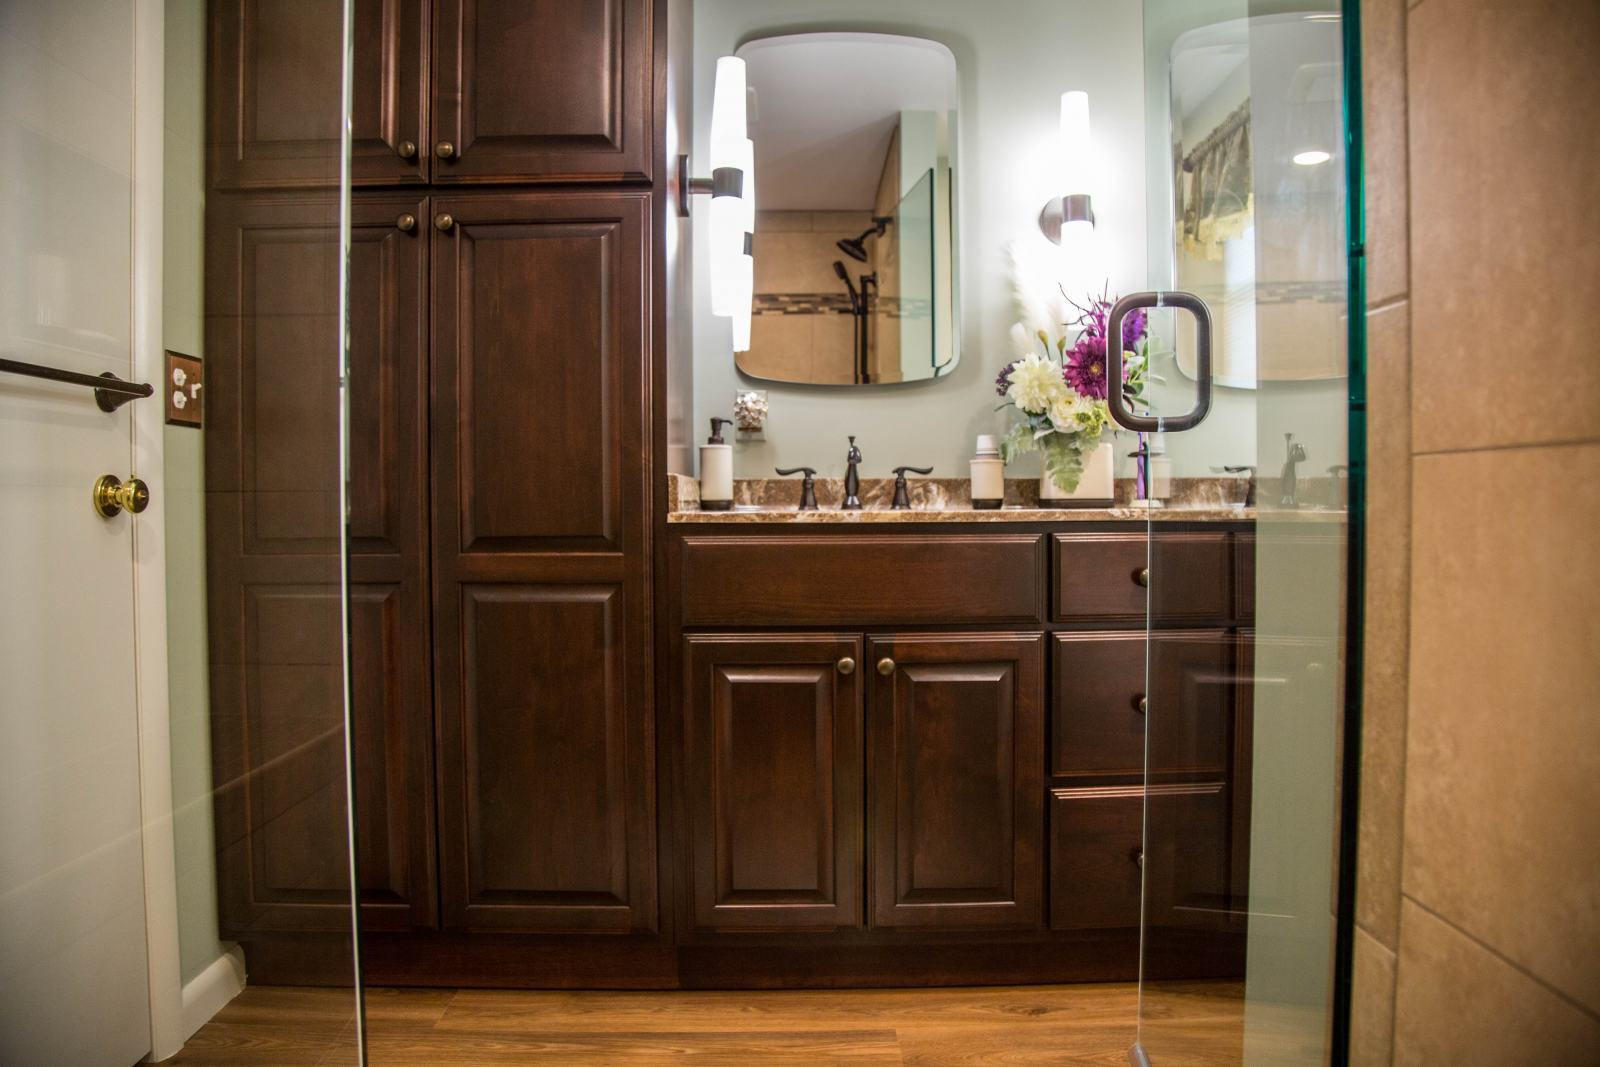 5 Inspiring Bathroom Remodeling Ideas Zephyr Thomas